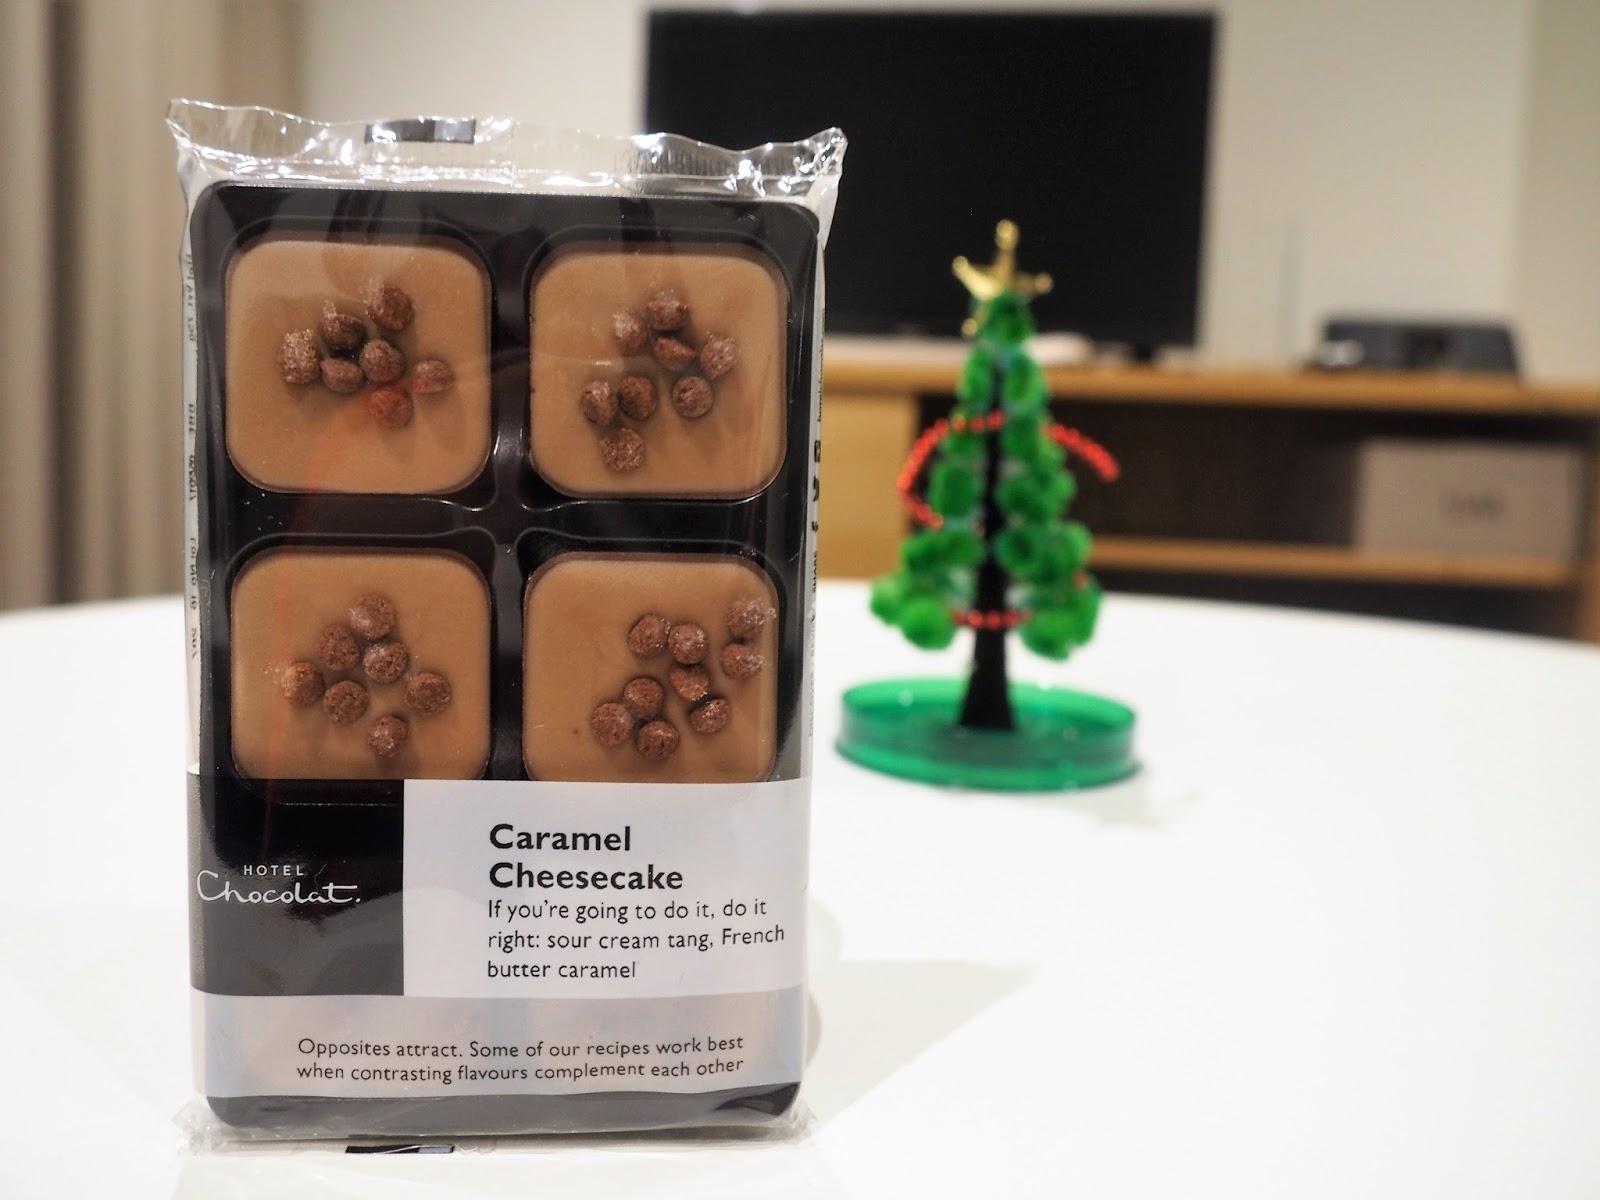 Hotel Chocolat caramel cheesecake selector